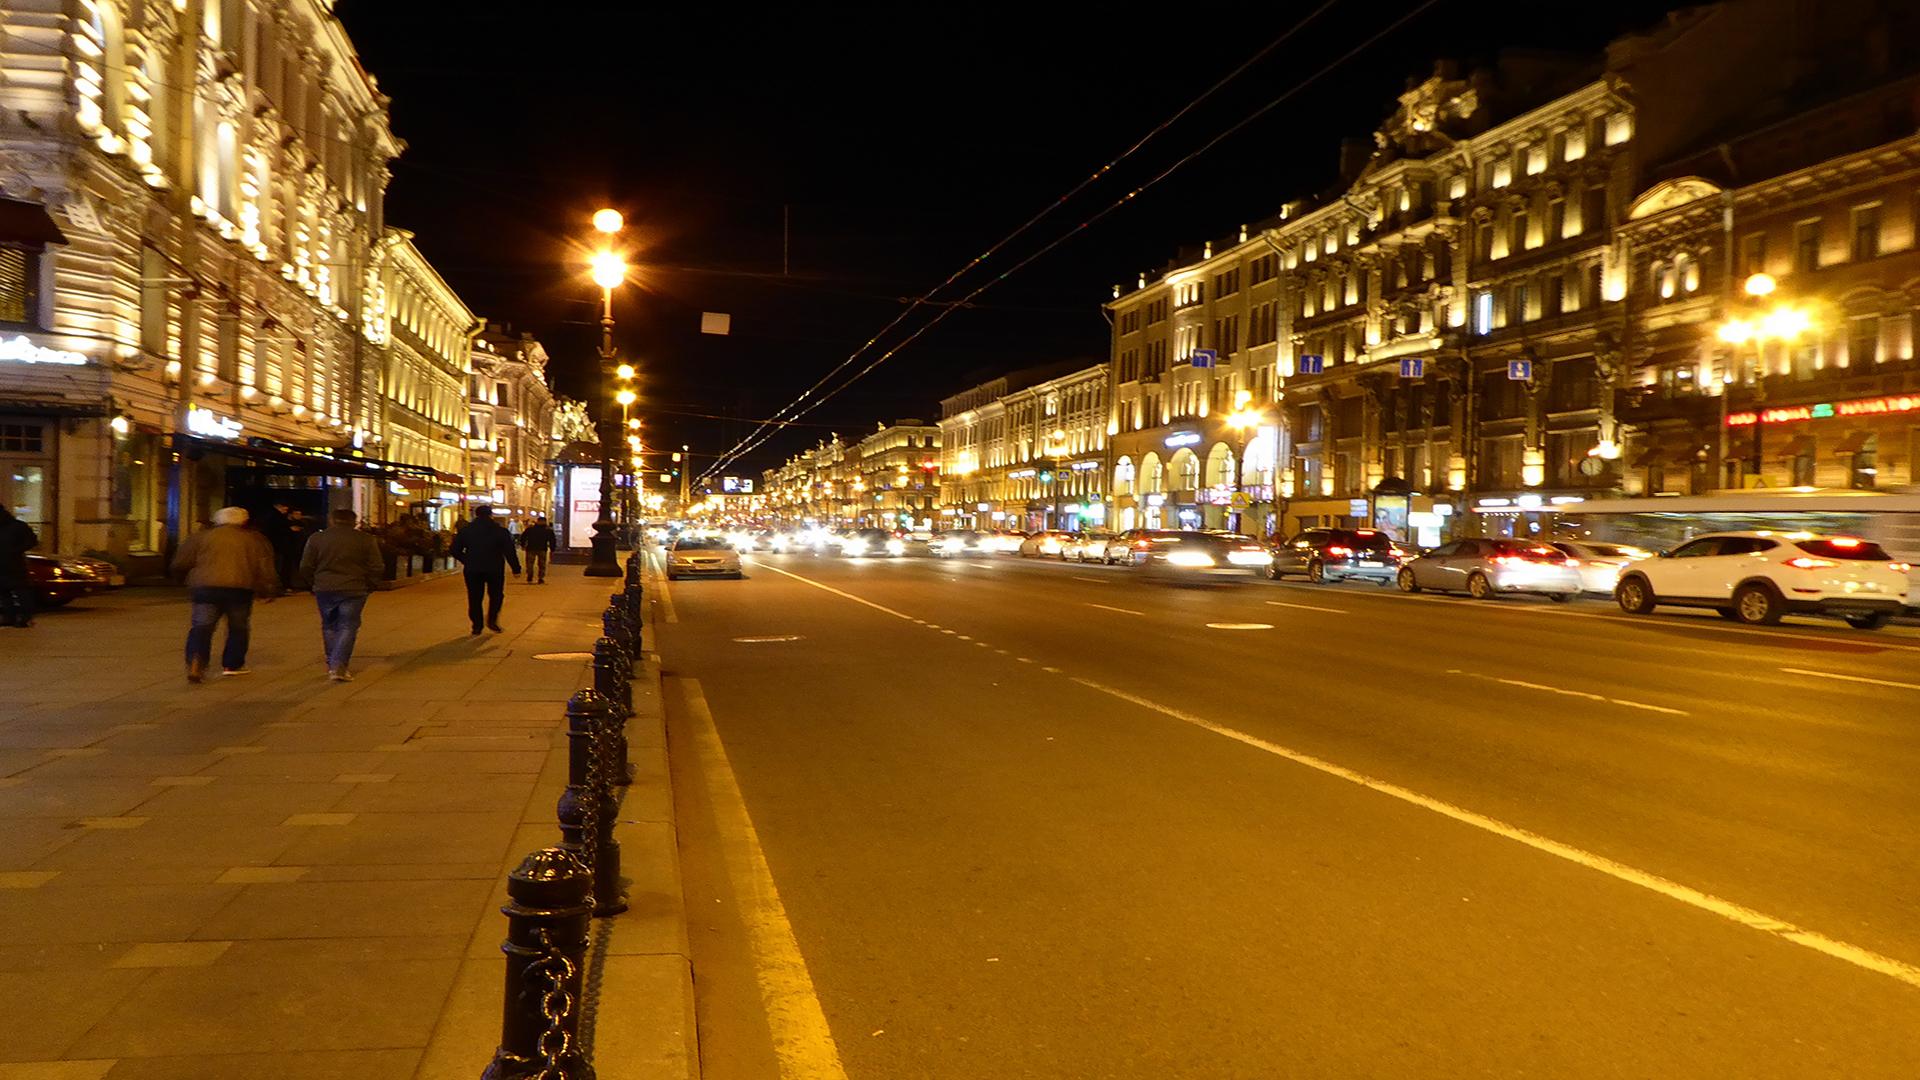 san pietroburgo-russia-nevskij